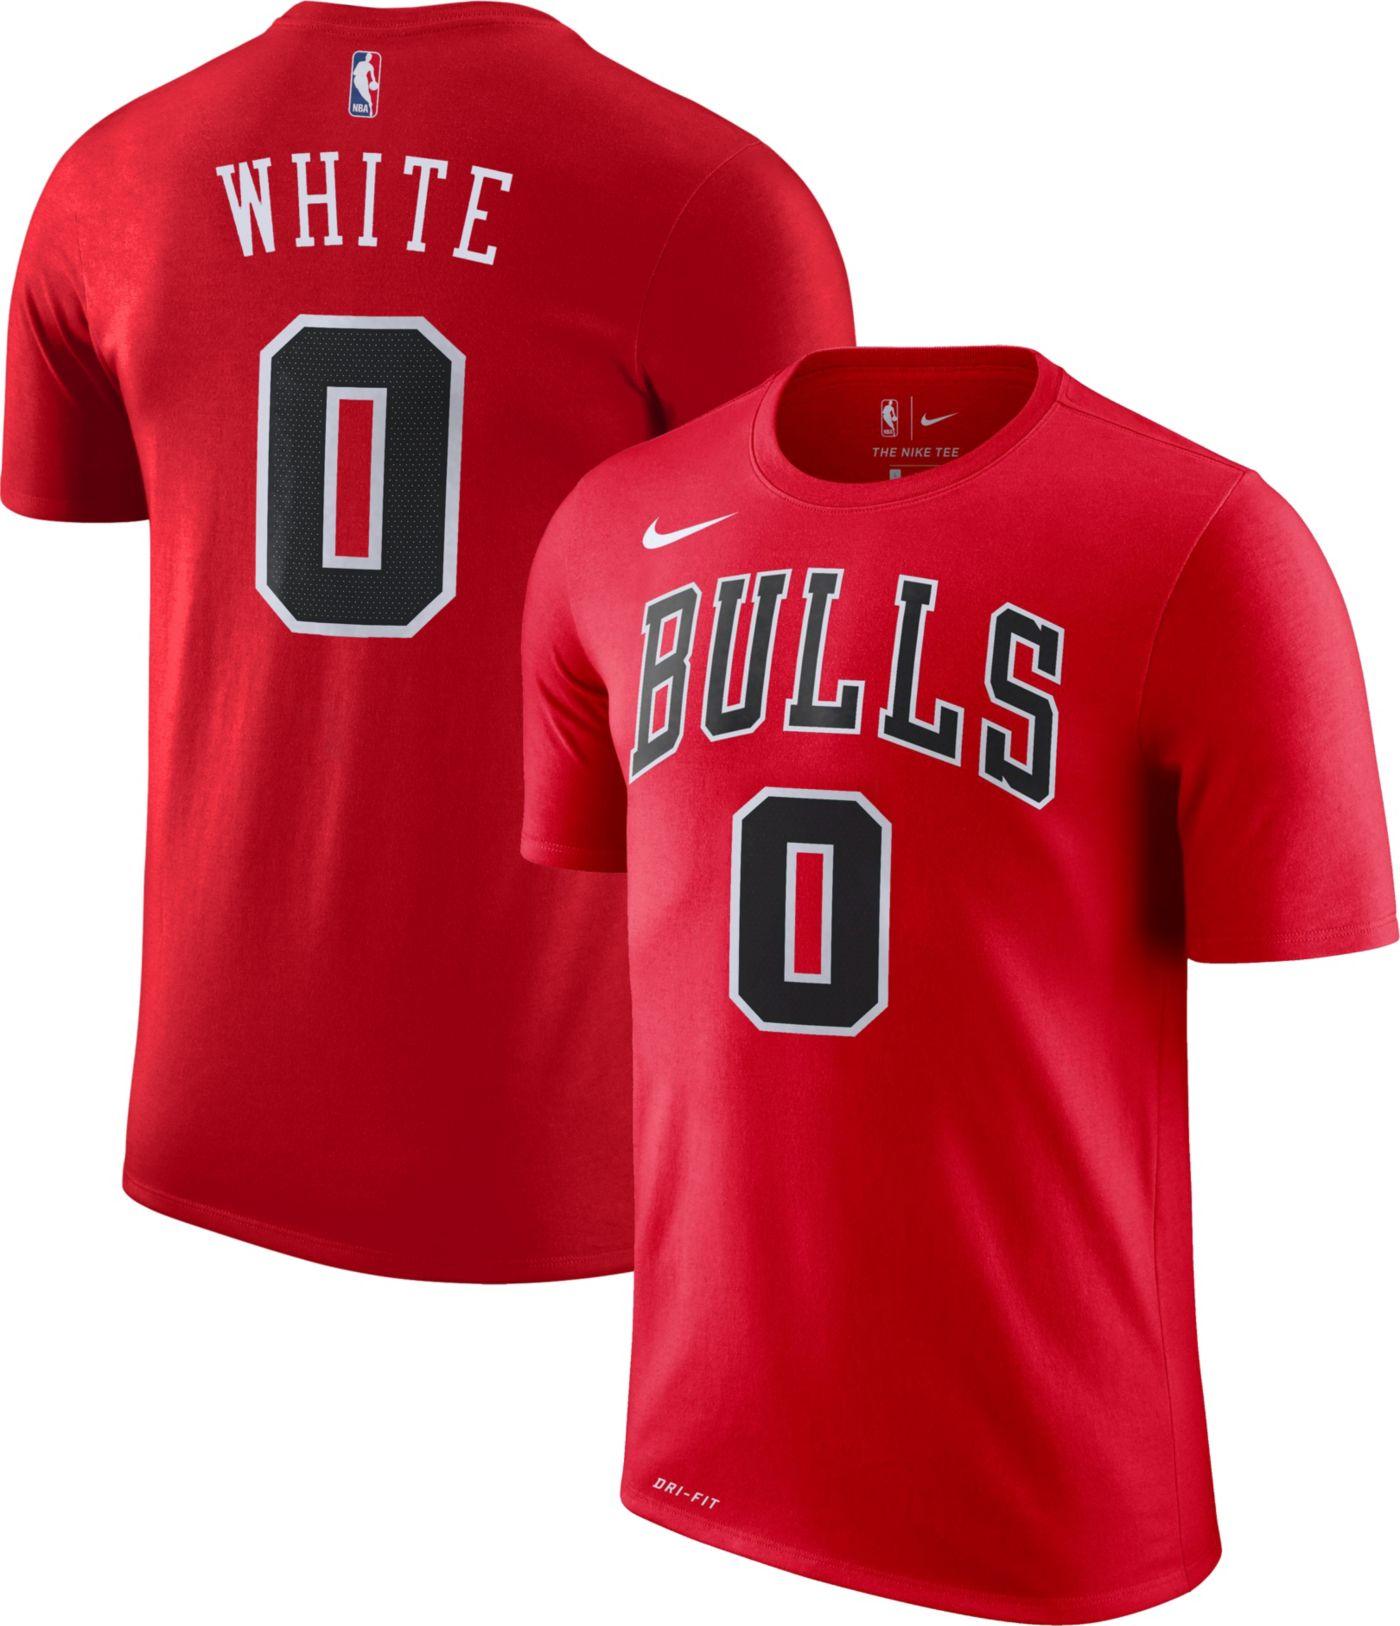 Nike Men's Chicago Bulls Coby White #0 Dri-FIT Red T-Shirt